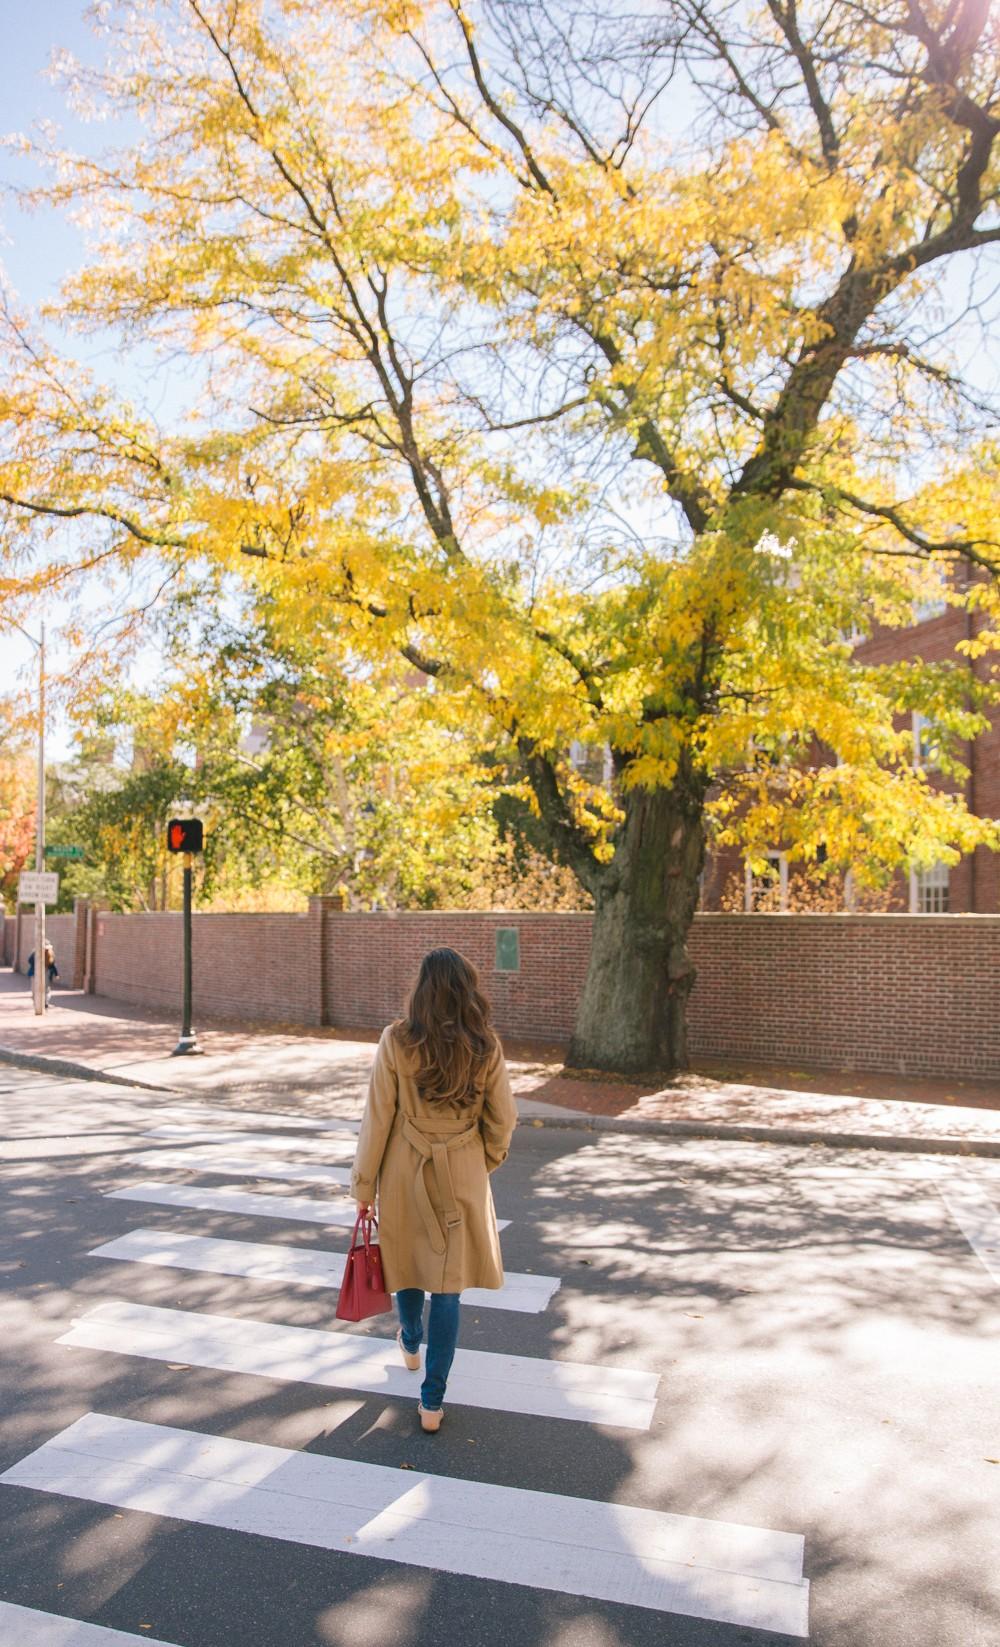 Crossing into fall